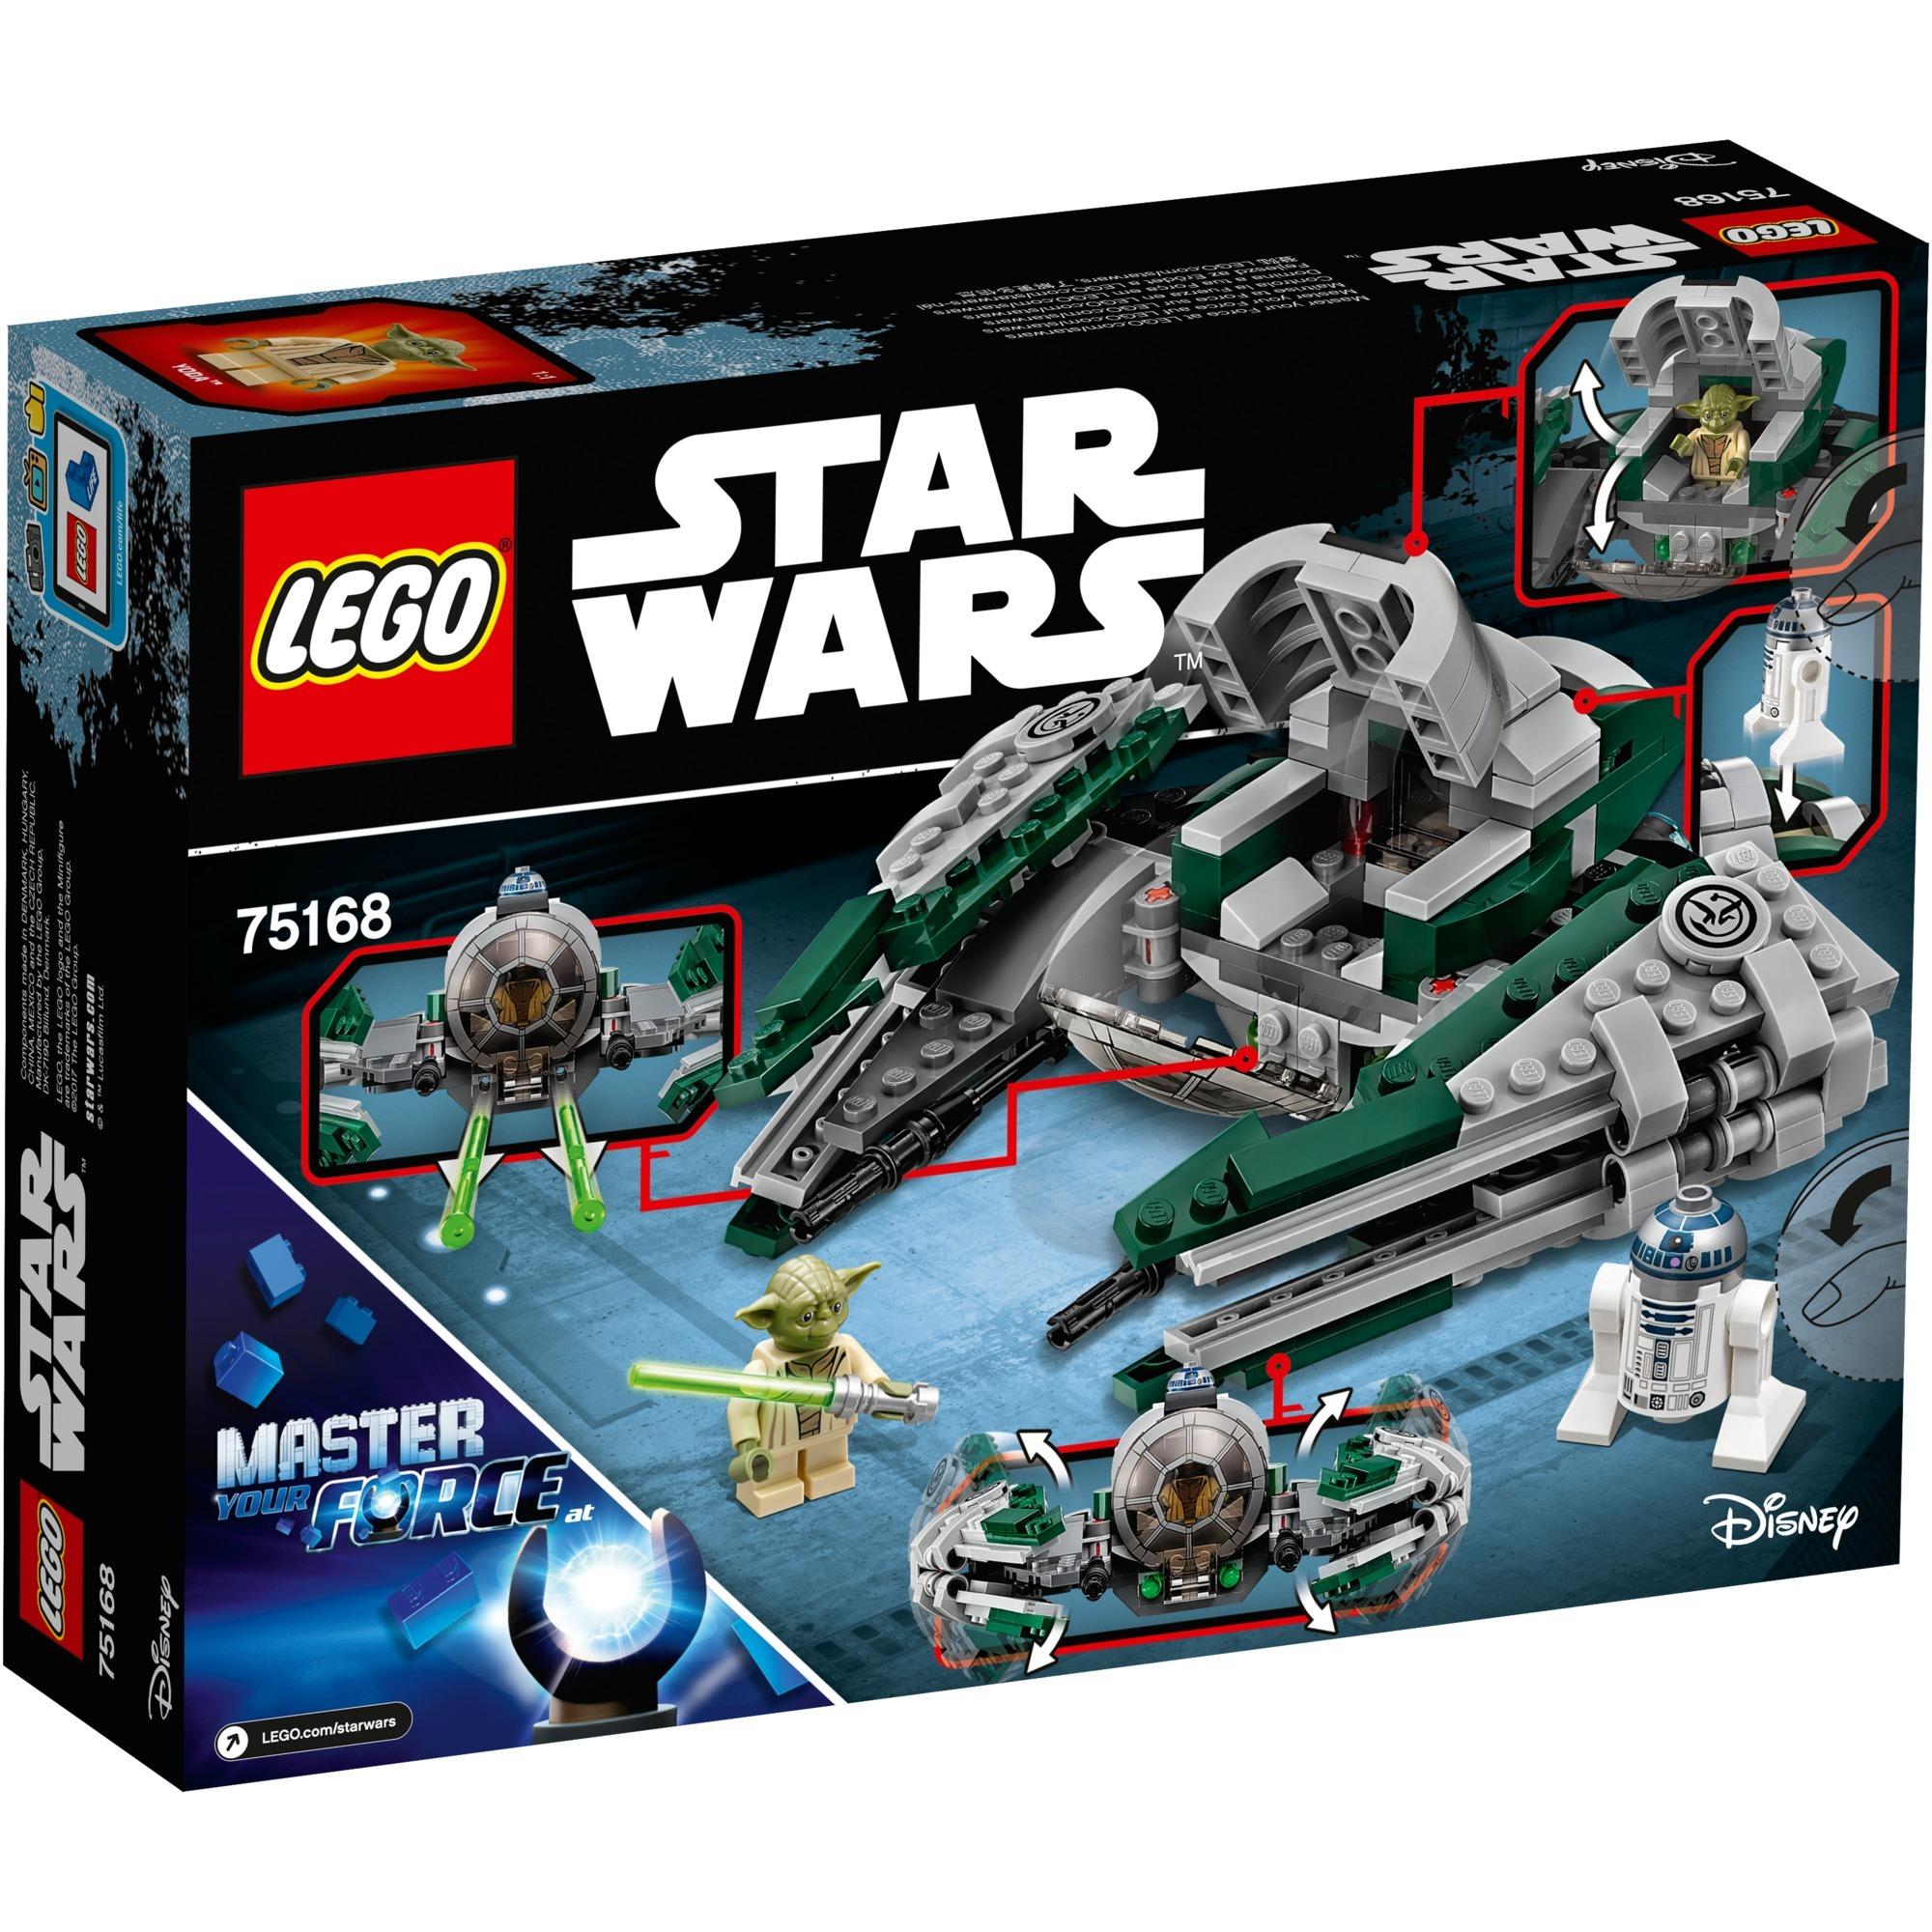 Star Wars - Yoda's Jedi Starfighter, Jouets de construction